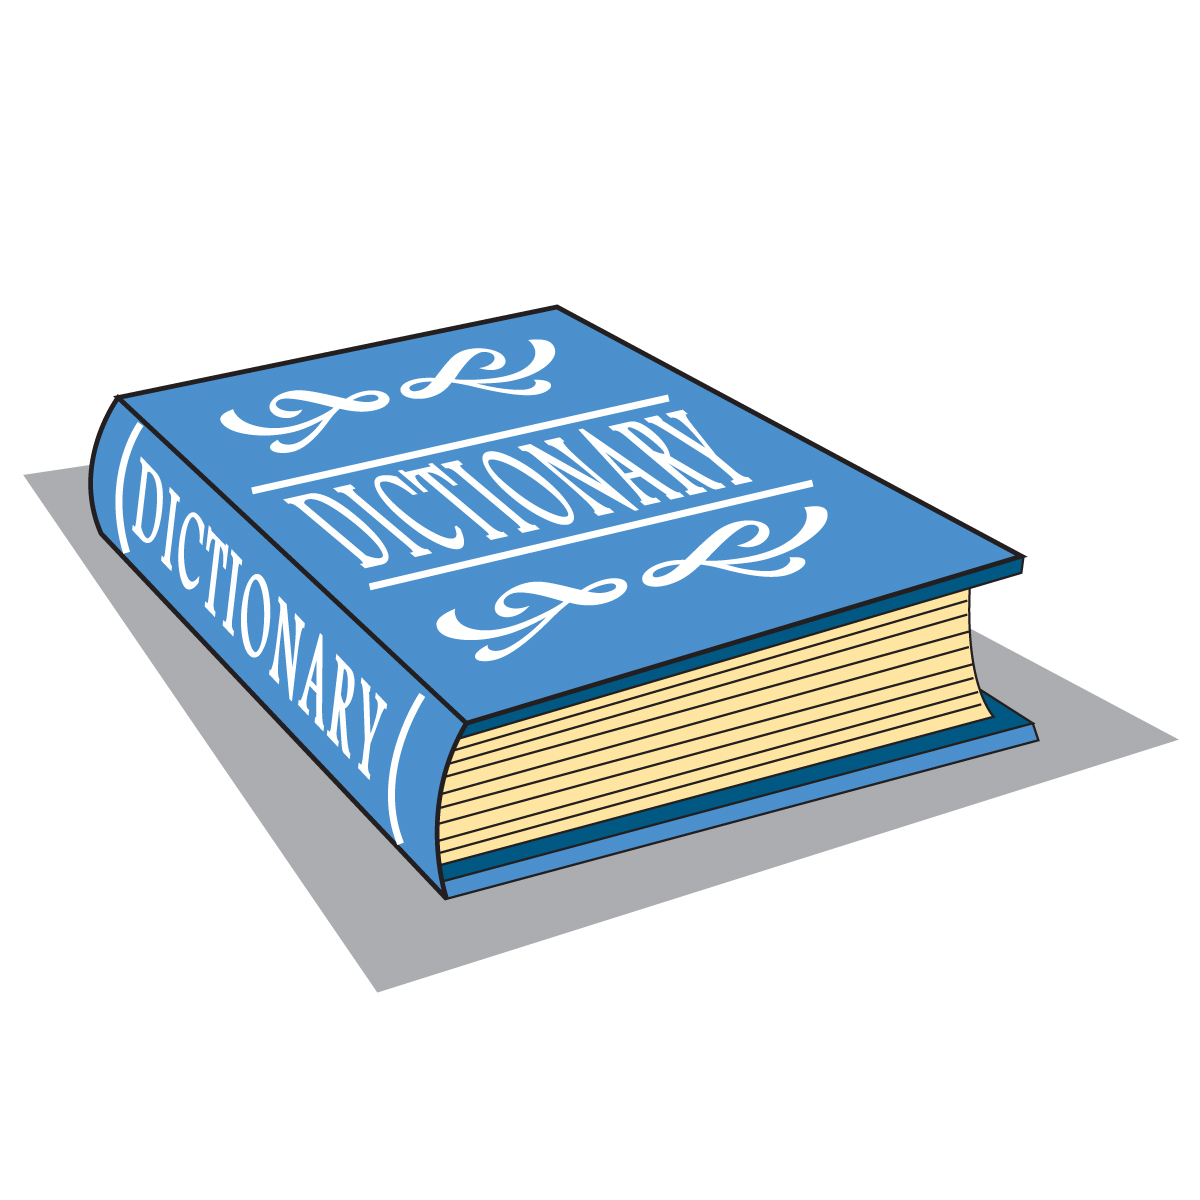 Dictionary Clip Art; Dictiona - Dictionary Clip Art